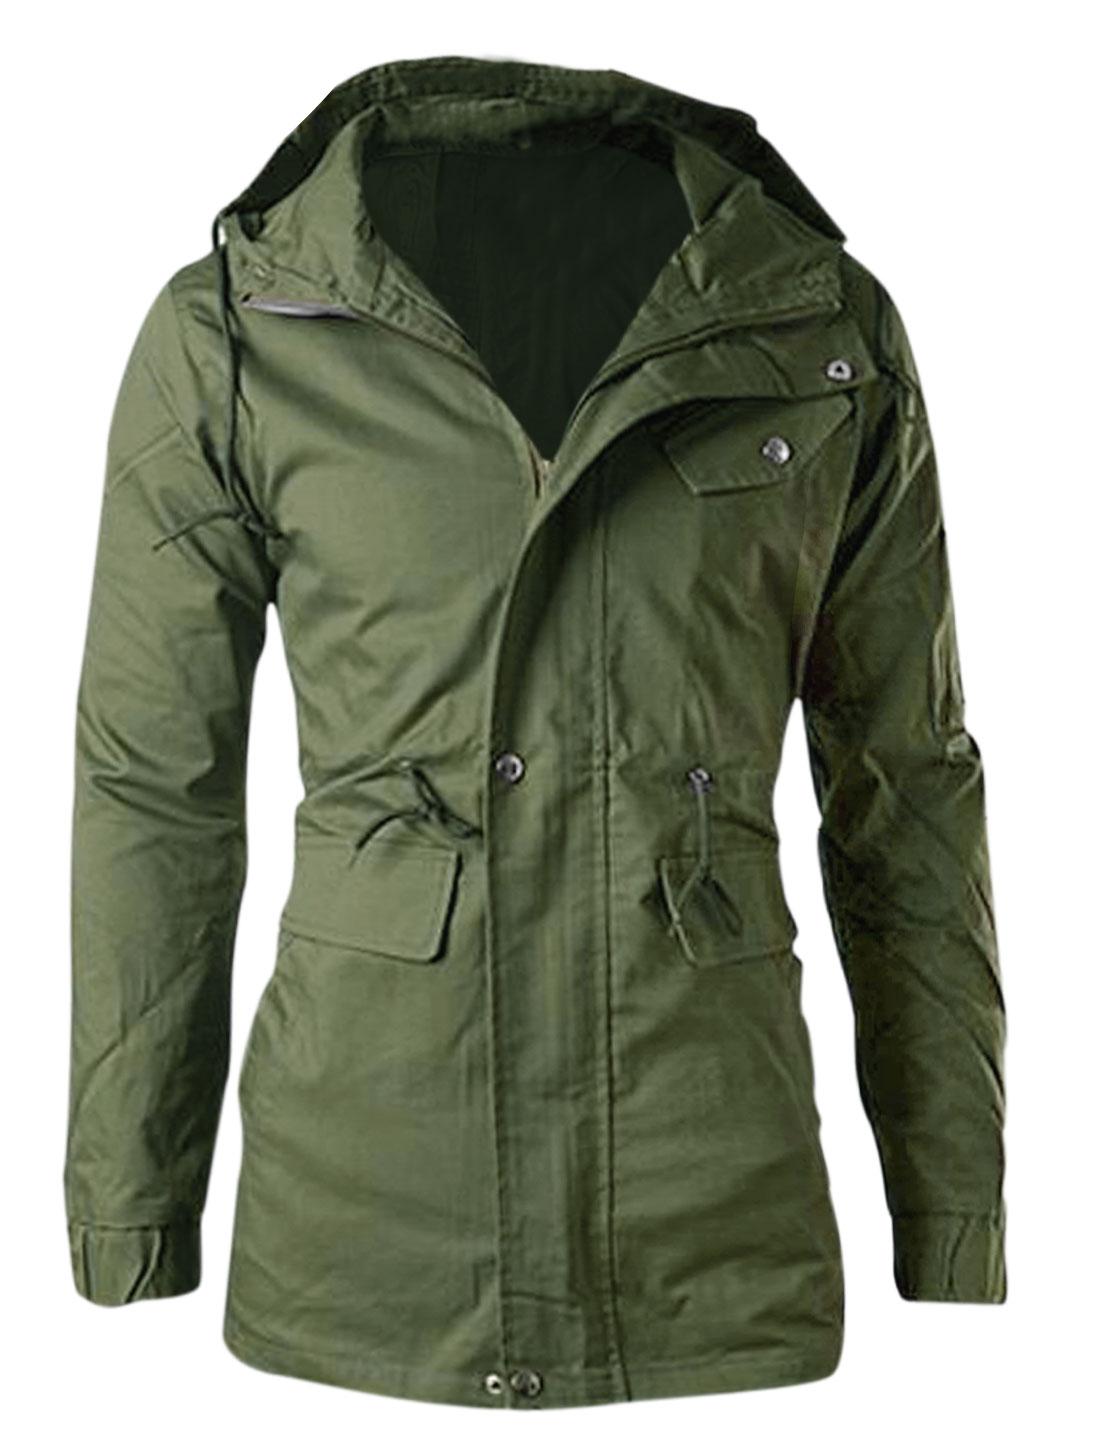 Men Zipper-Up Elastic Cuffs Hooded Drawstring Fashion Jacket Army Green M